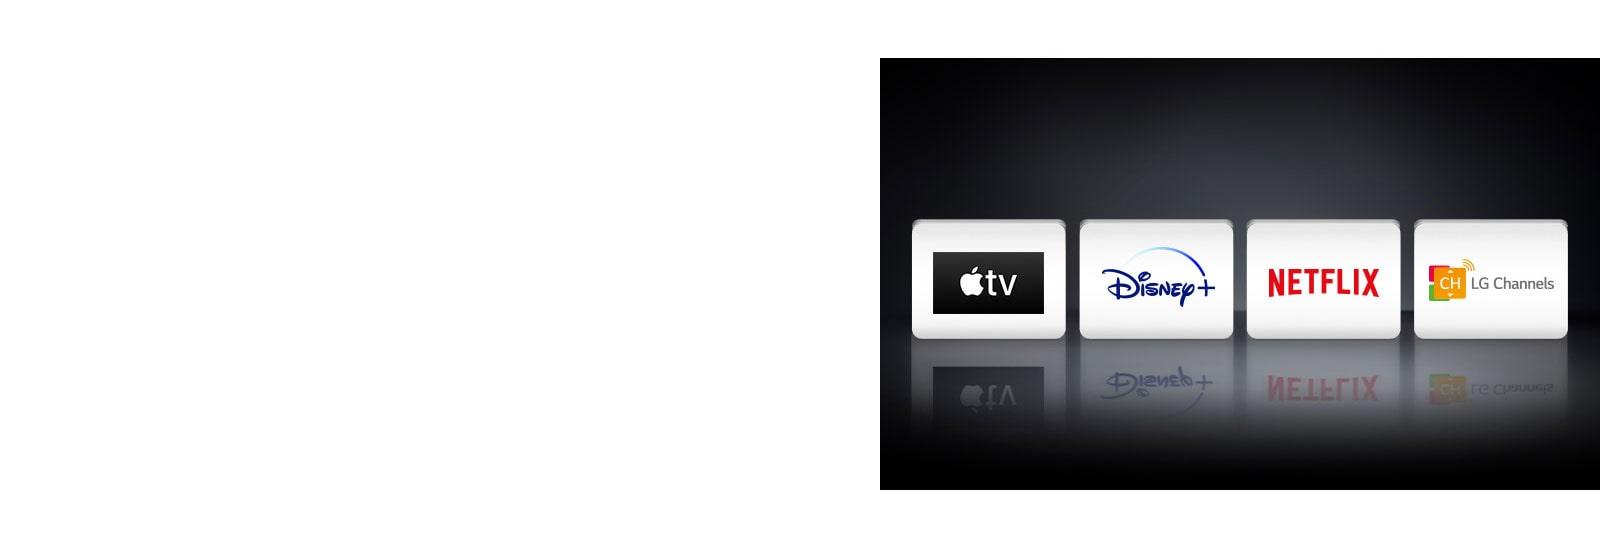 Four logos: The Apple TV app, Disney+, Netflix and LG Channels